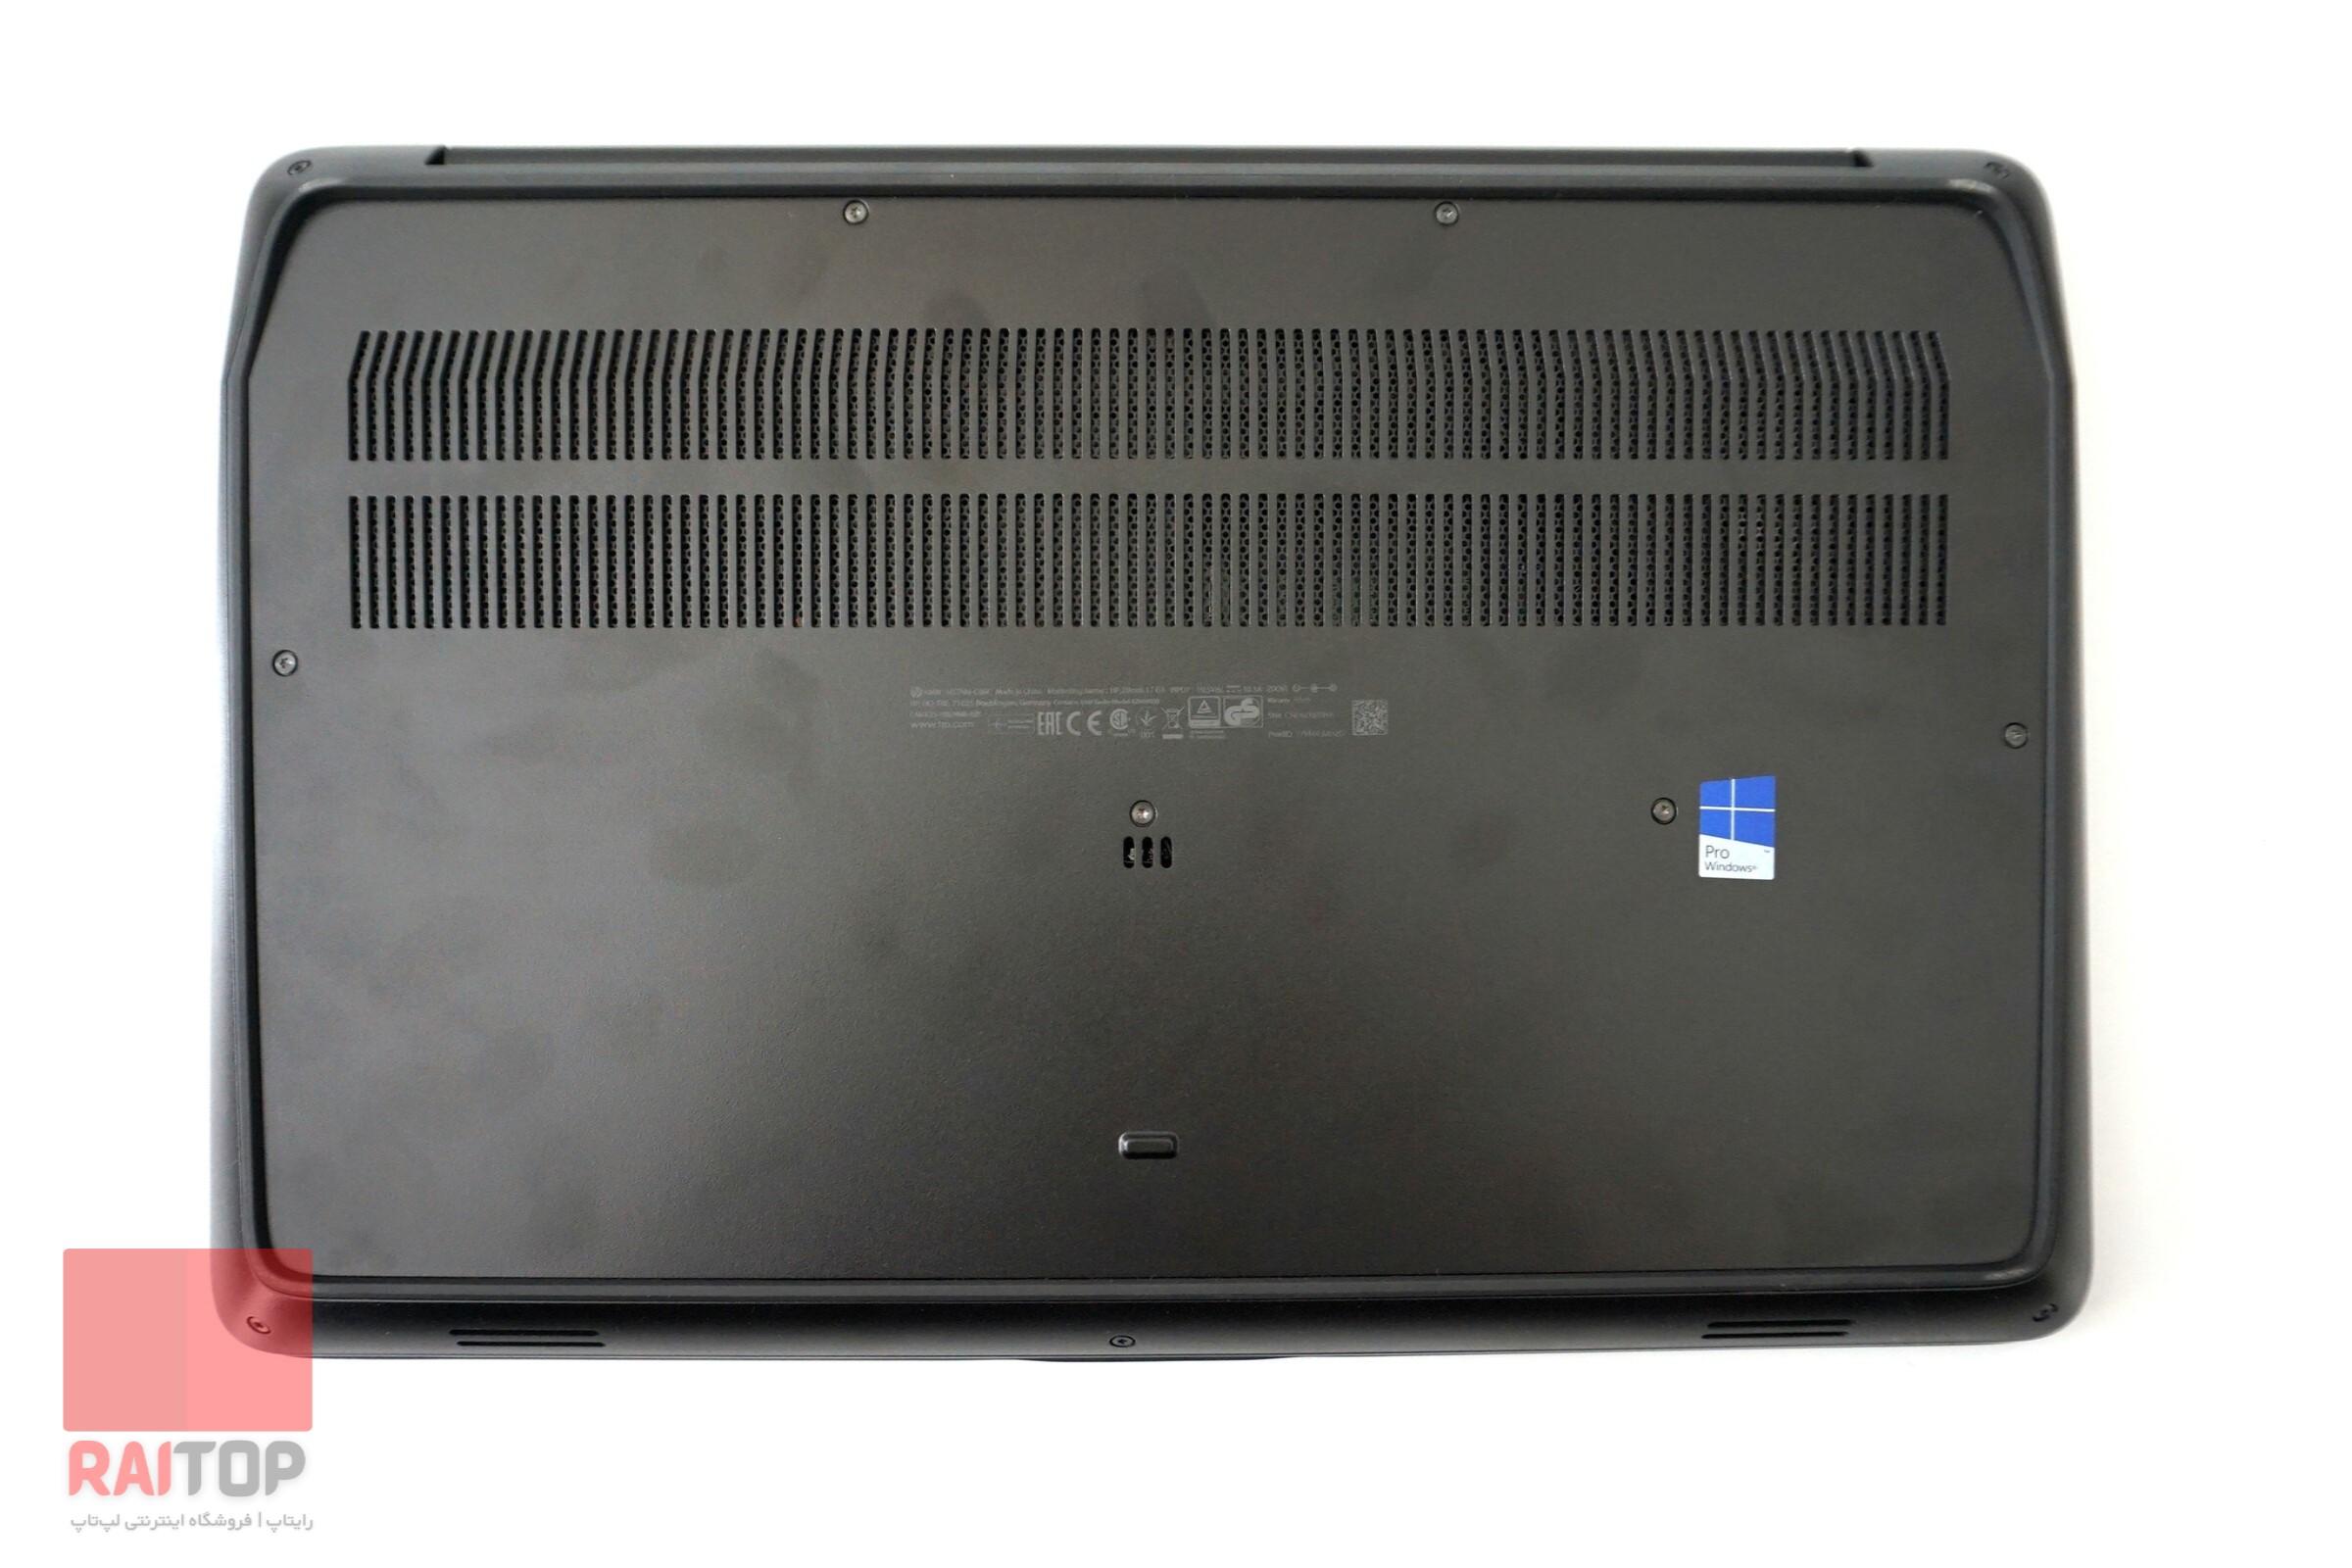 لپ تاپ 17 اینچی HP مدل ZBook 17 G3 قاب زیر